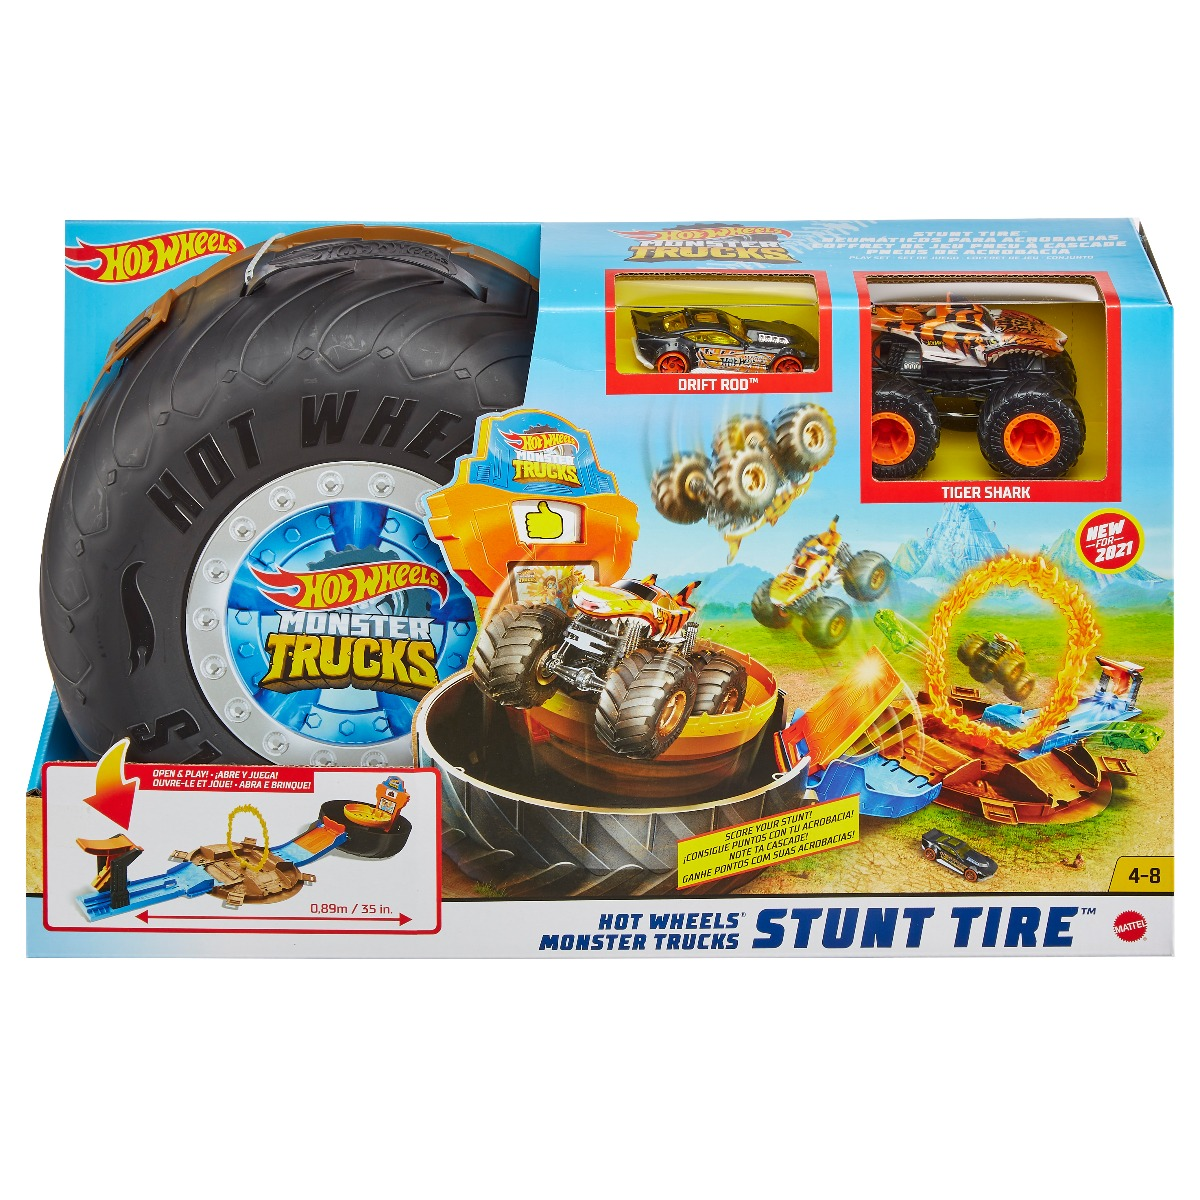 Set de joaca Circuit cu obstacole Hot Wheels Monster Truck, Stunt Ride